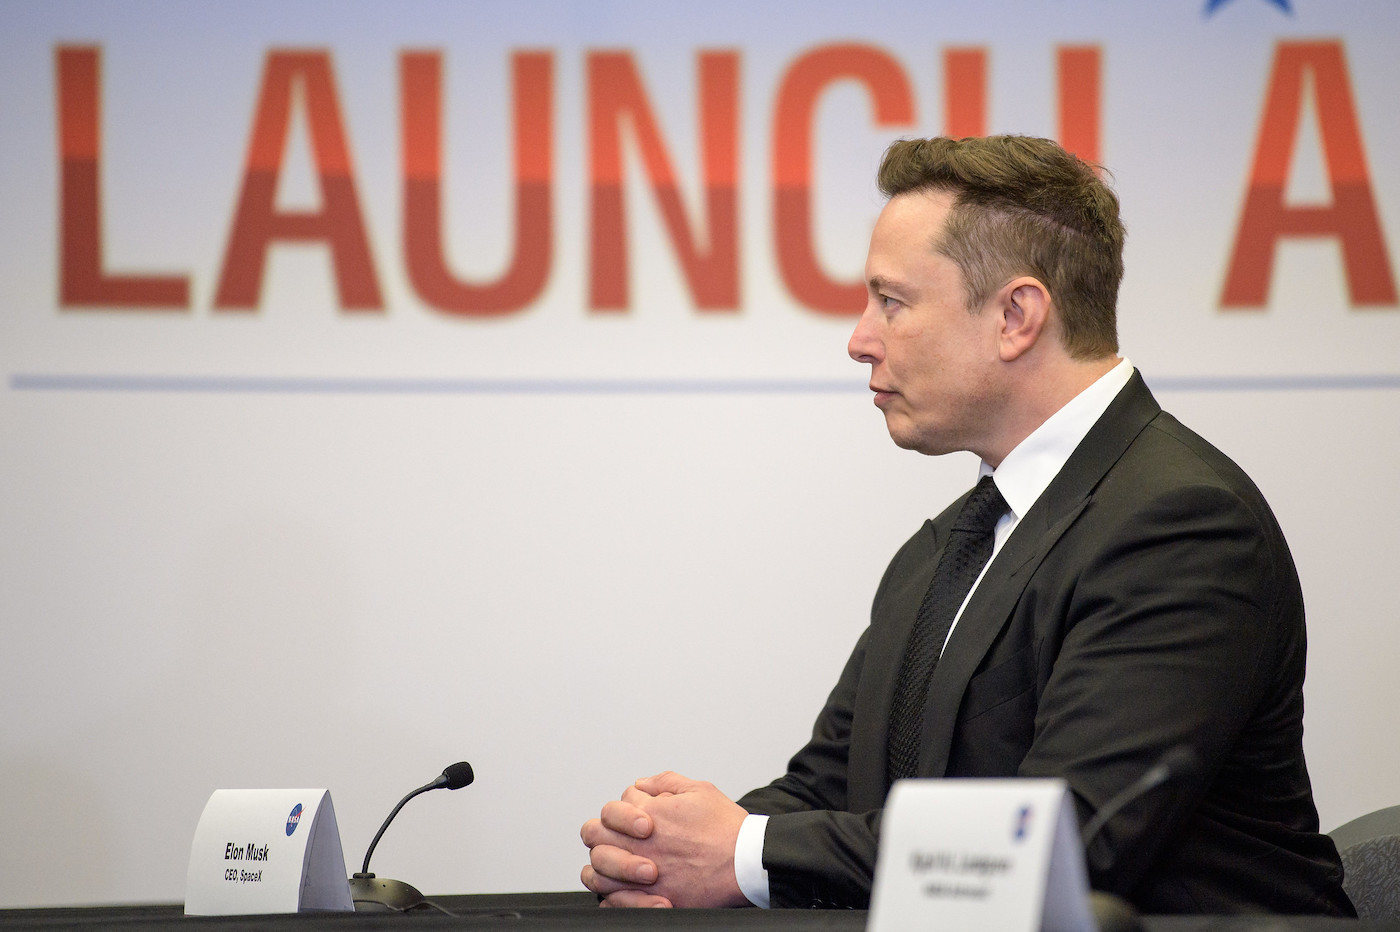 Elon Musk Crew Dragon SpaceX